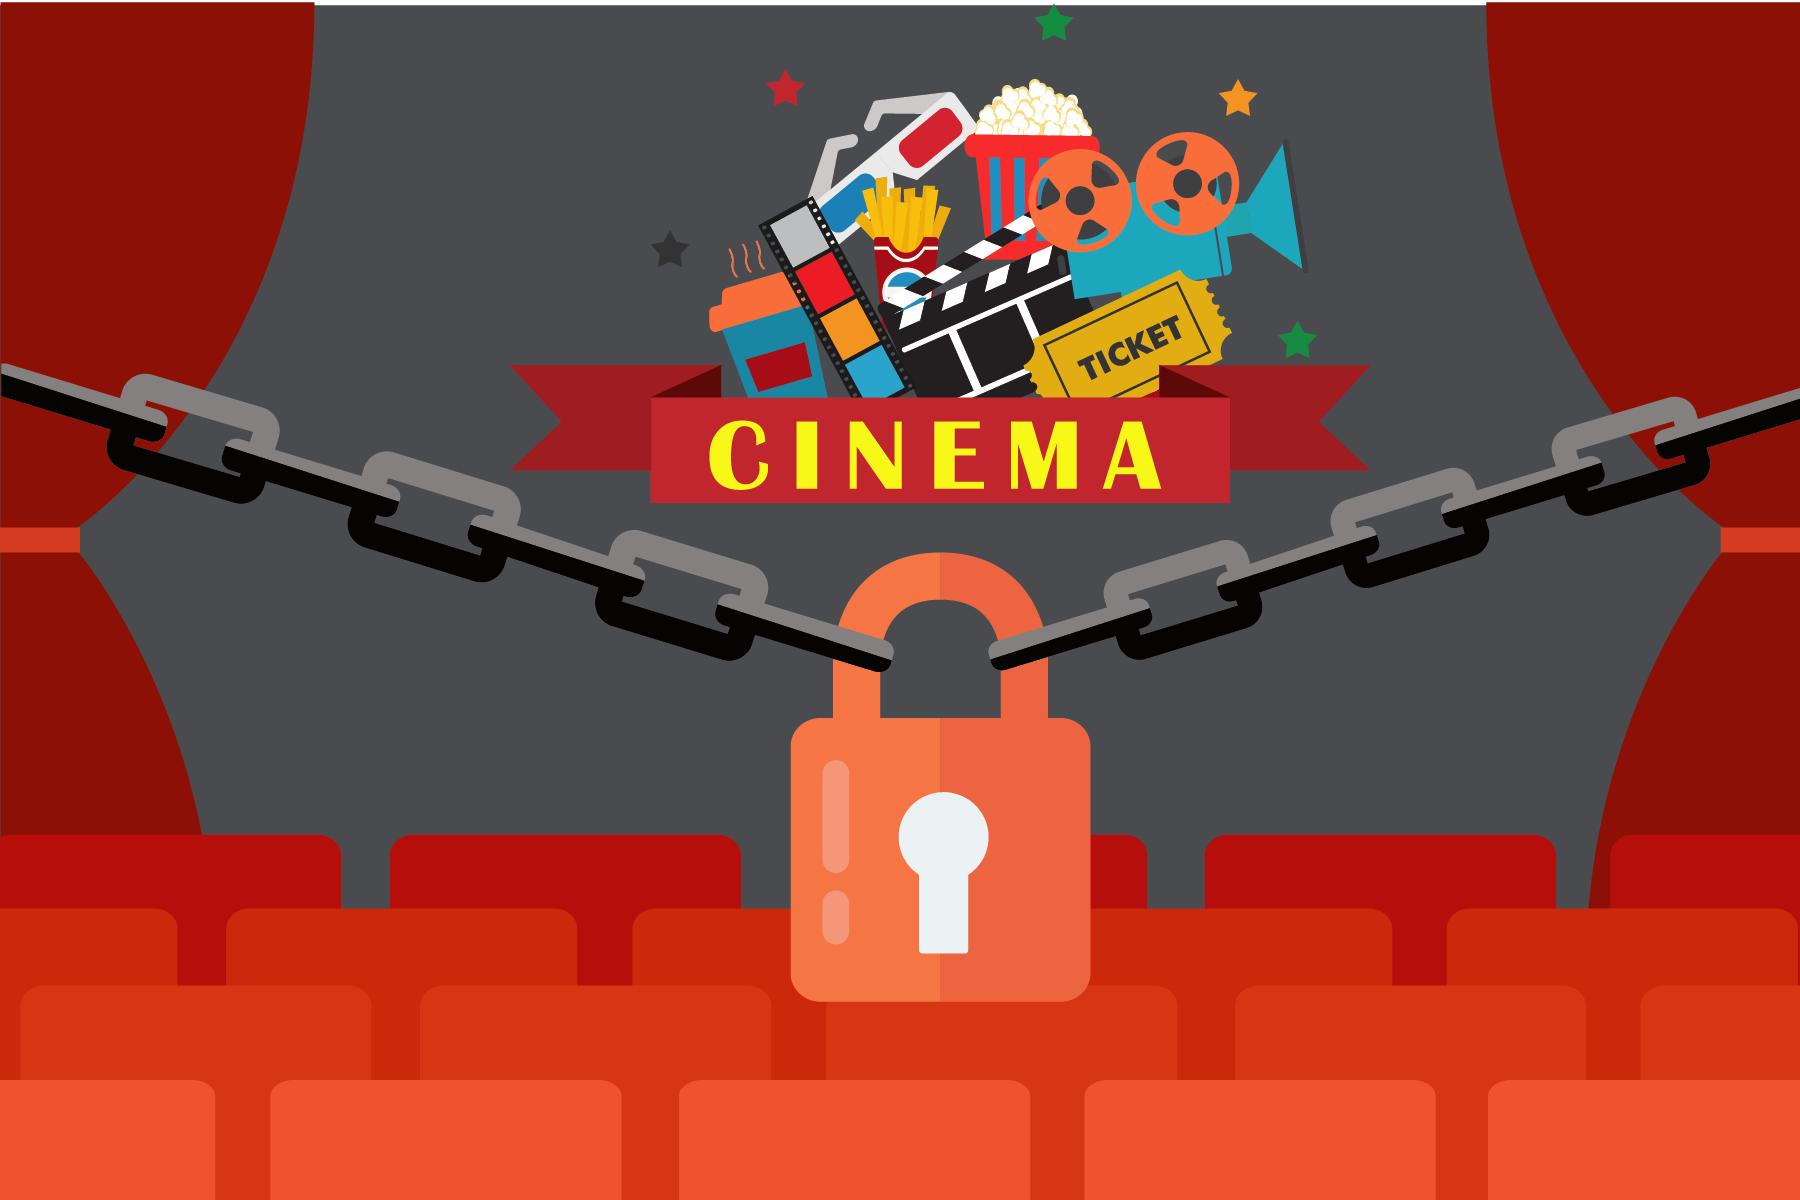 cinema e teatro